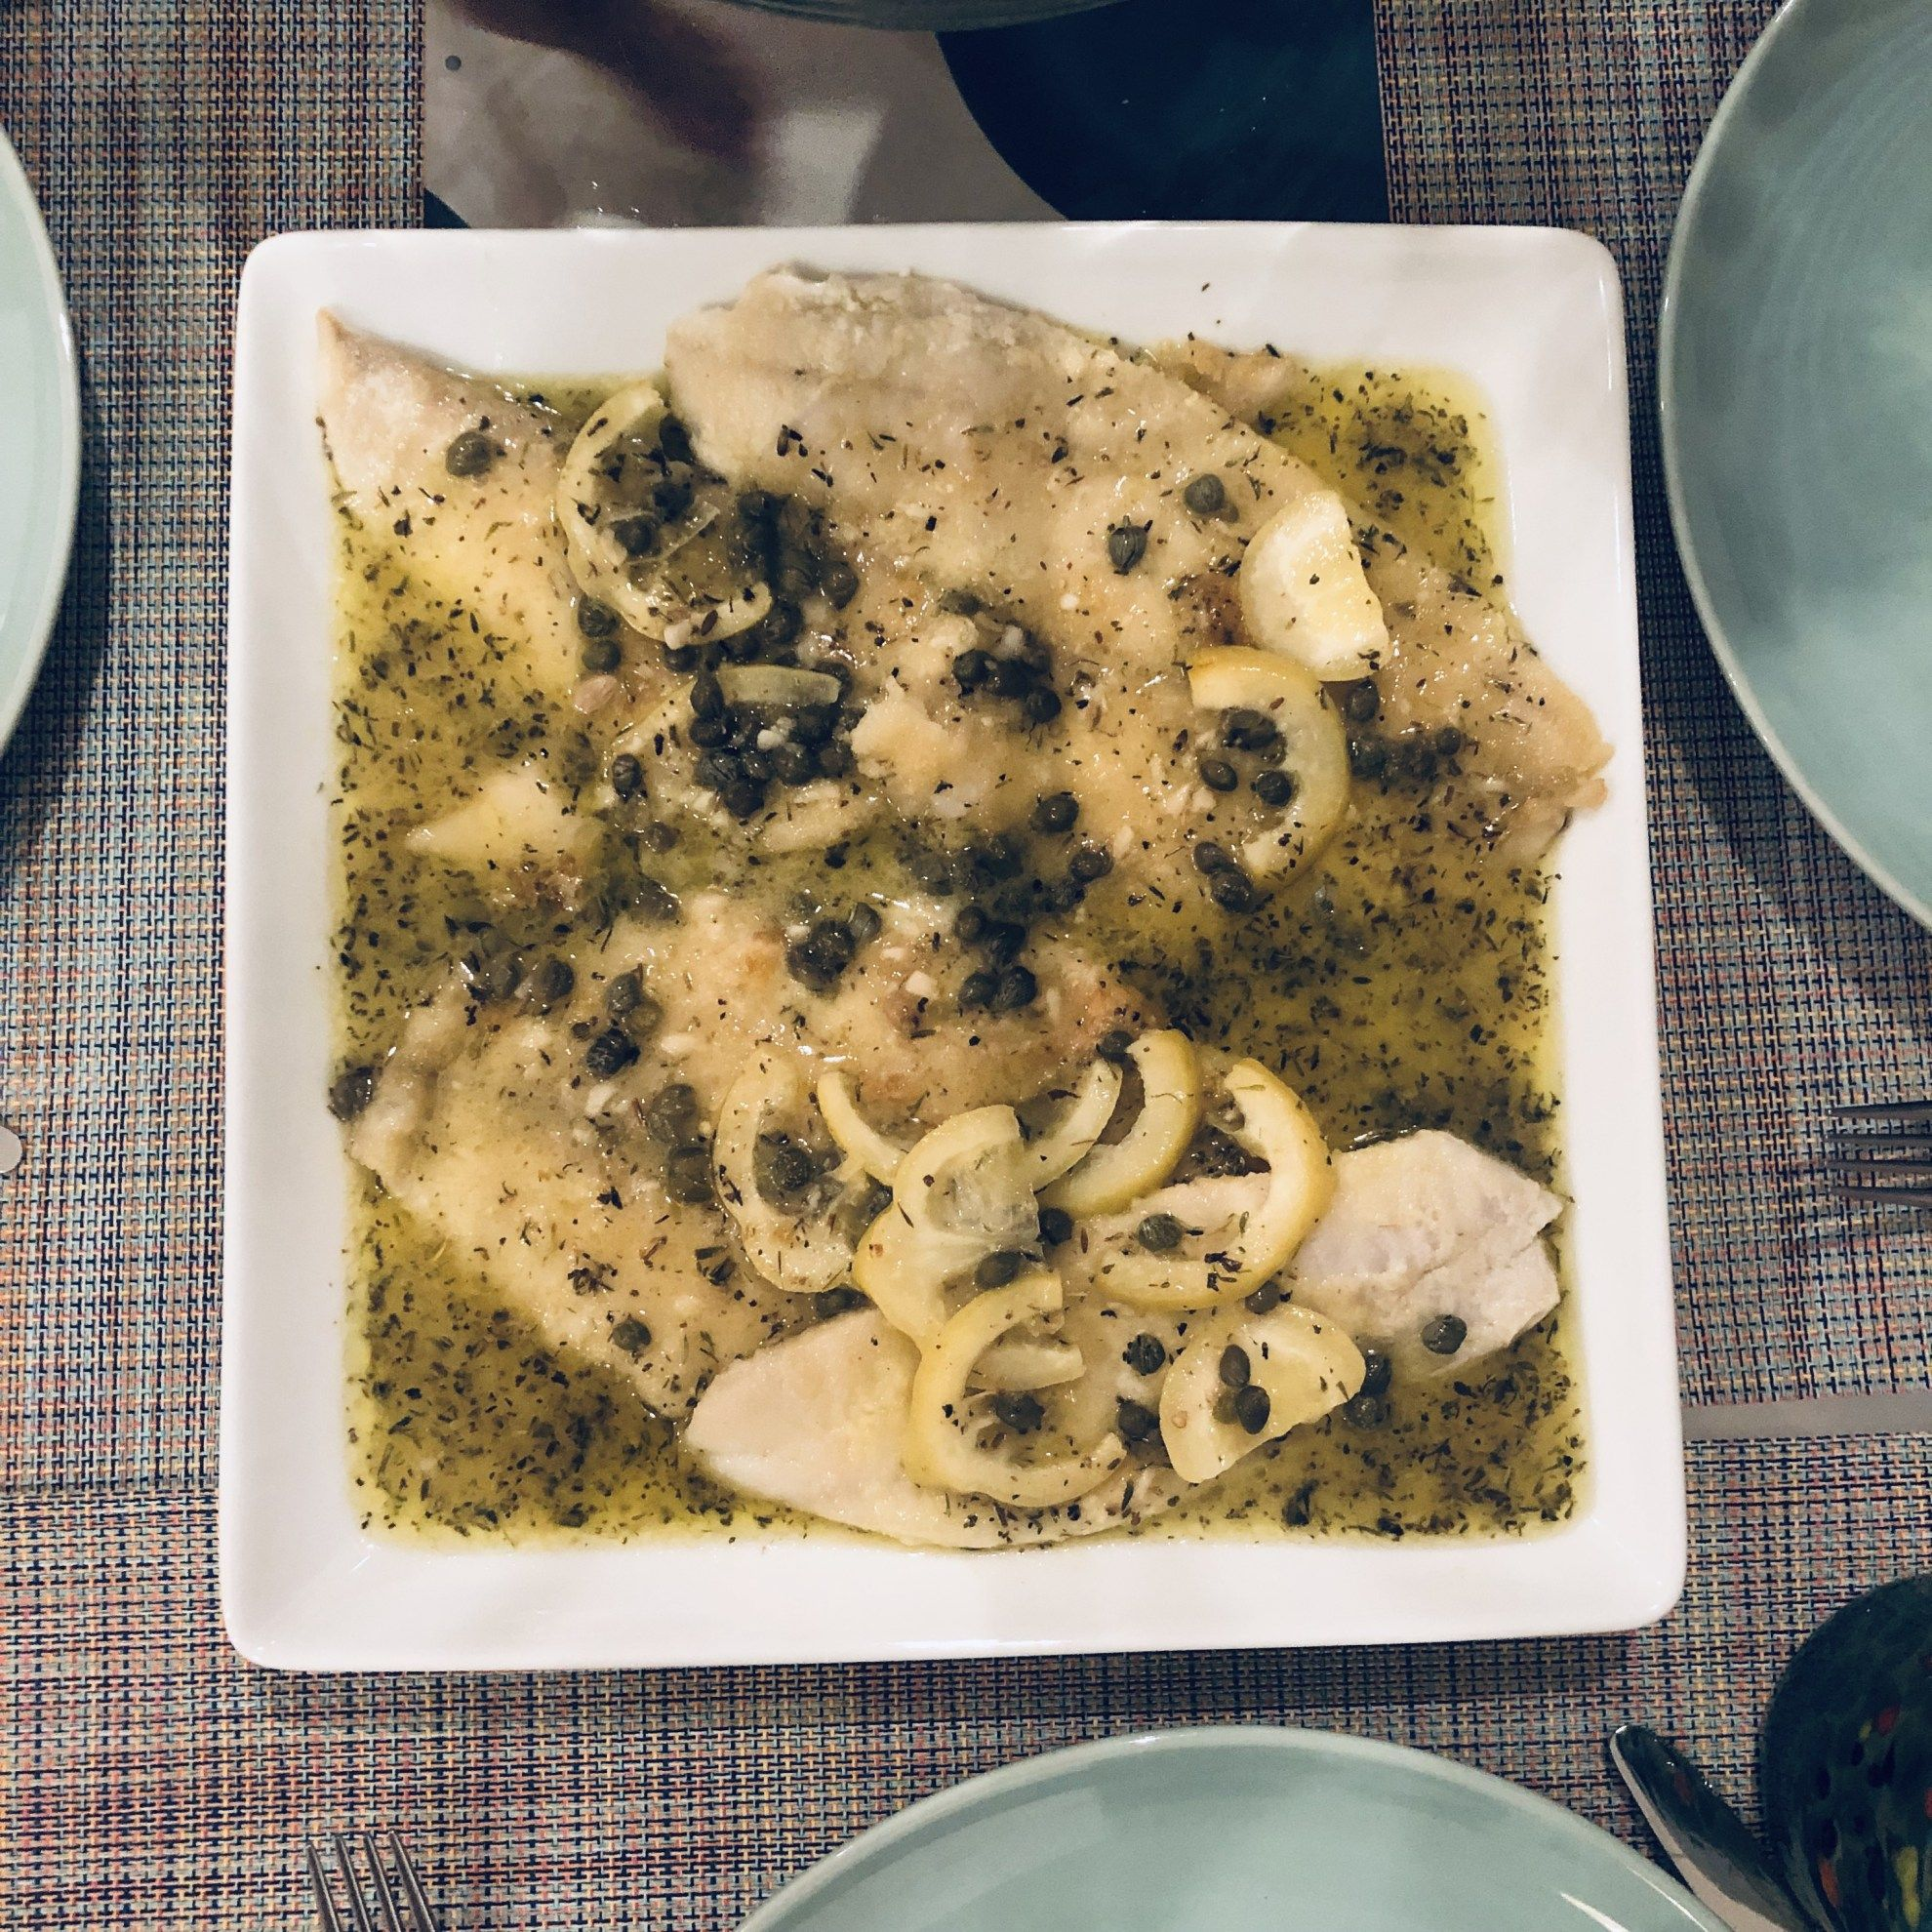 Photo of Sole Filet in Lemon-Caper Sauce